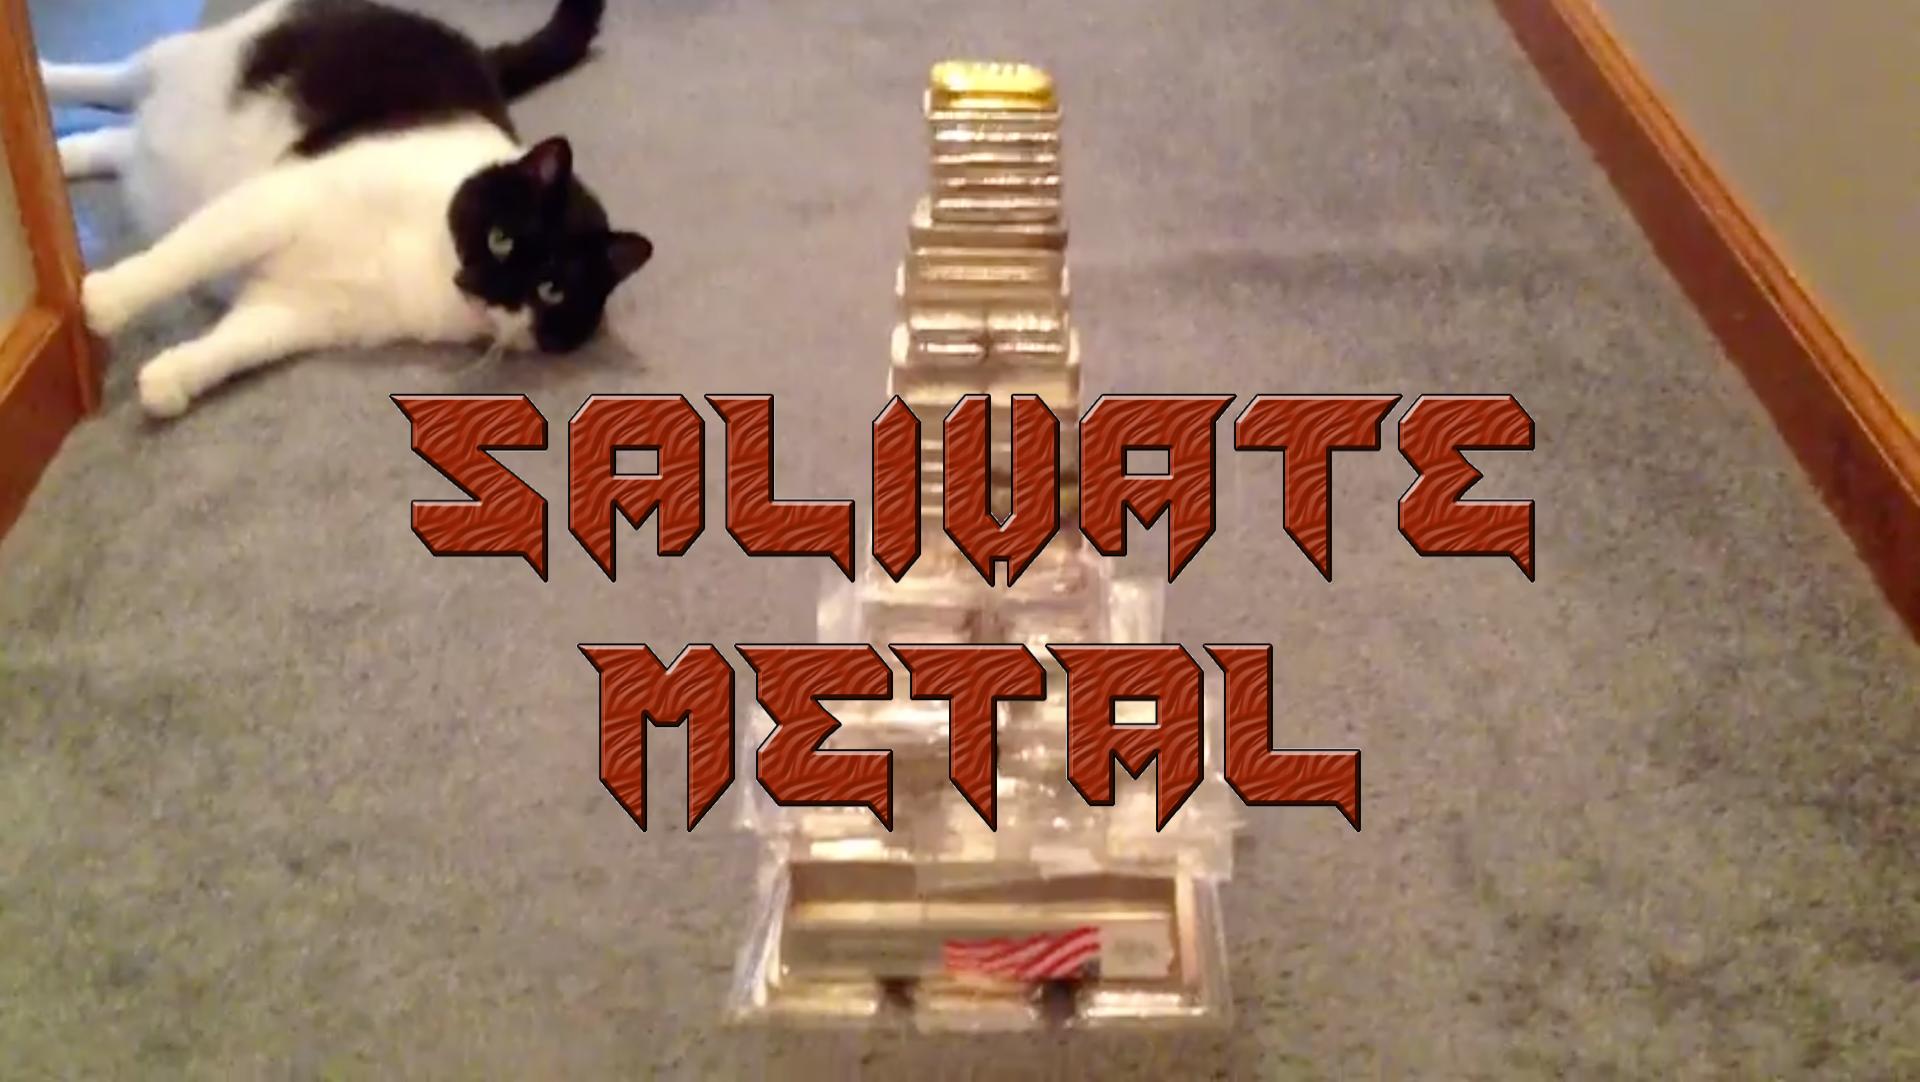 Silver Stacker Youtube Channel host SalivateMetal Salivate Metal SD Bullion SDBullion.com gold silver podcast